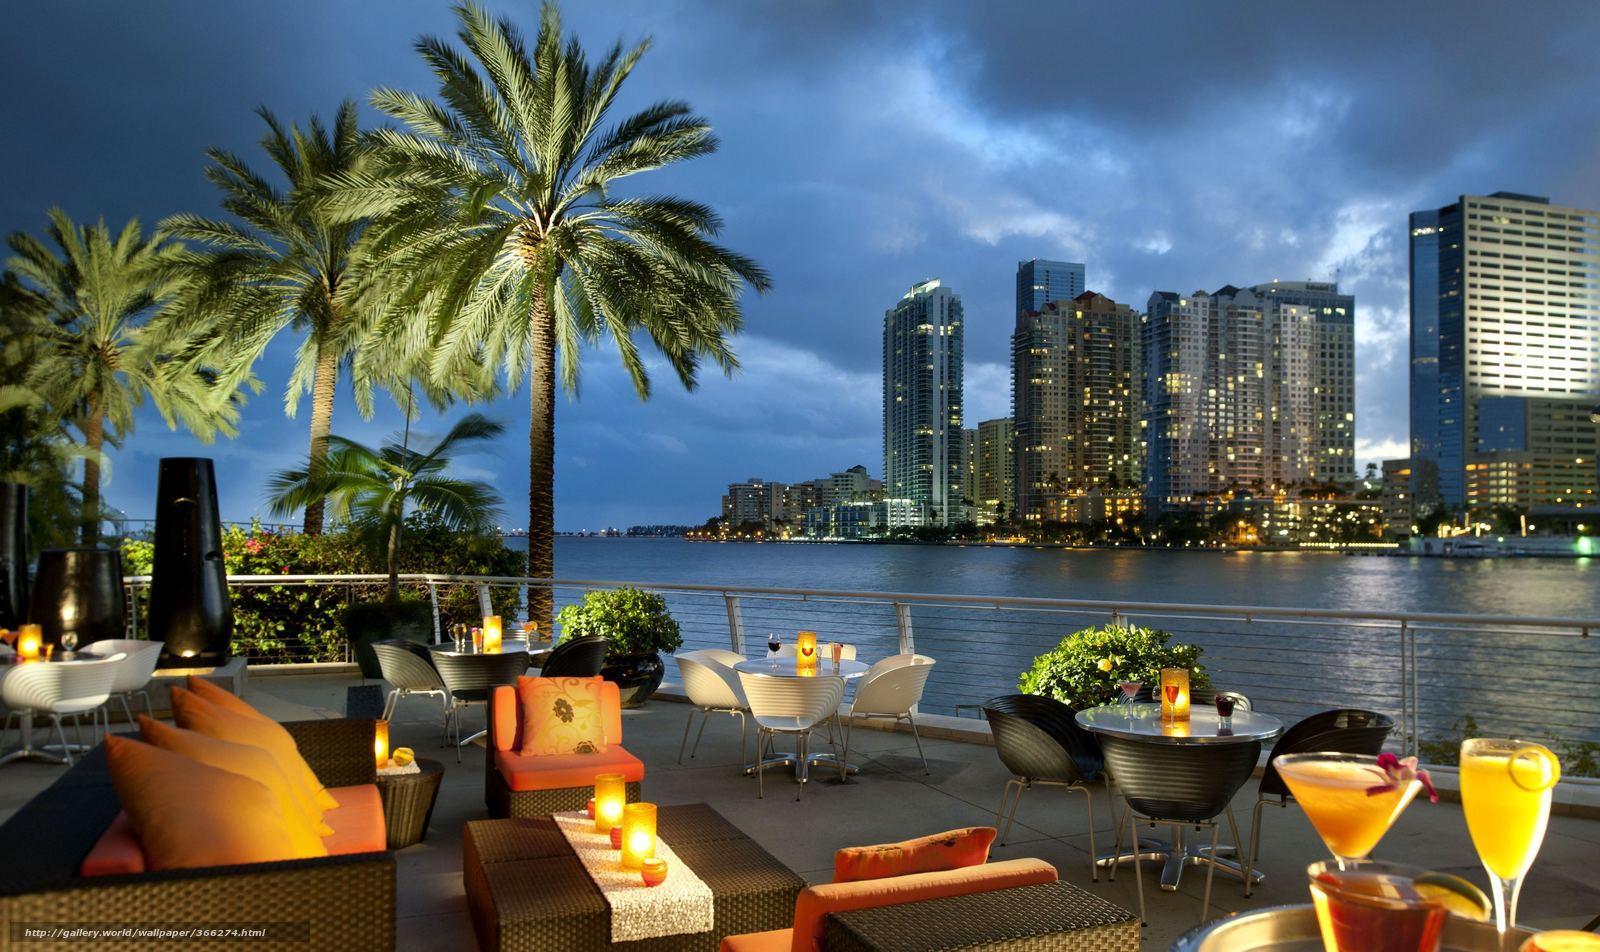 Download wallpaper Miami Florida USA city desktop wallpaper in 1600x952